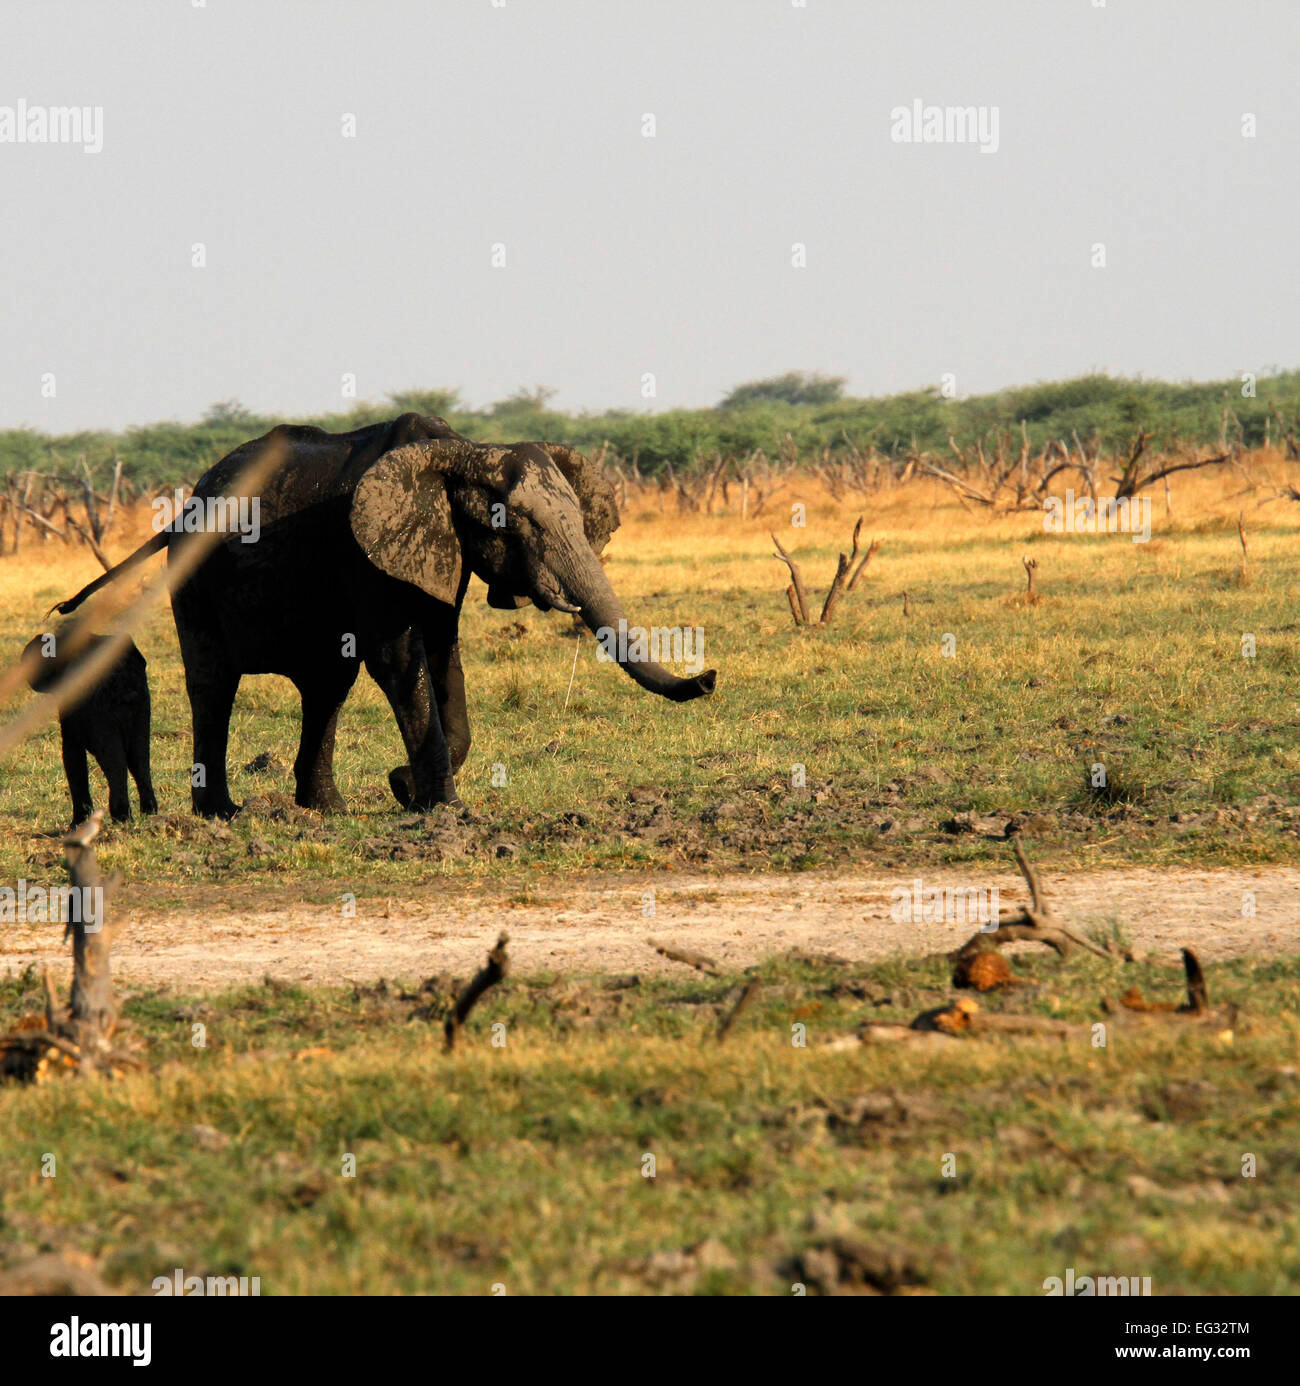 Scared Elephants Stock Photos & Scared Elephants Stock Images - Alamy